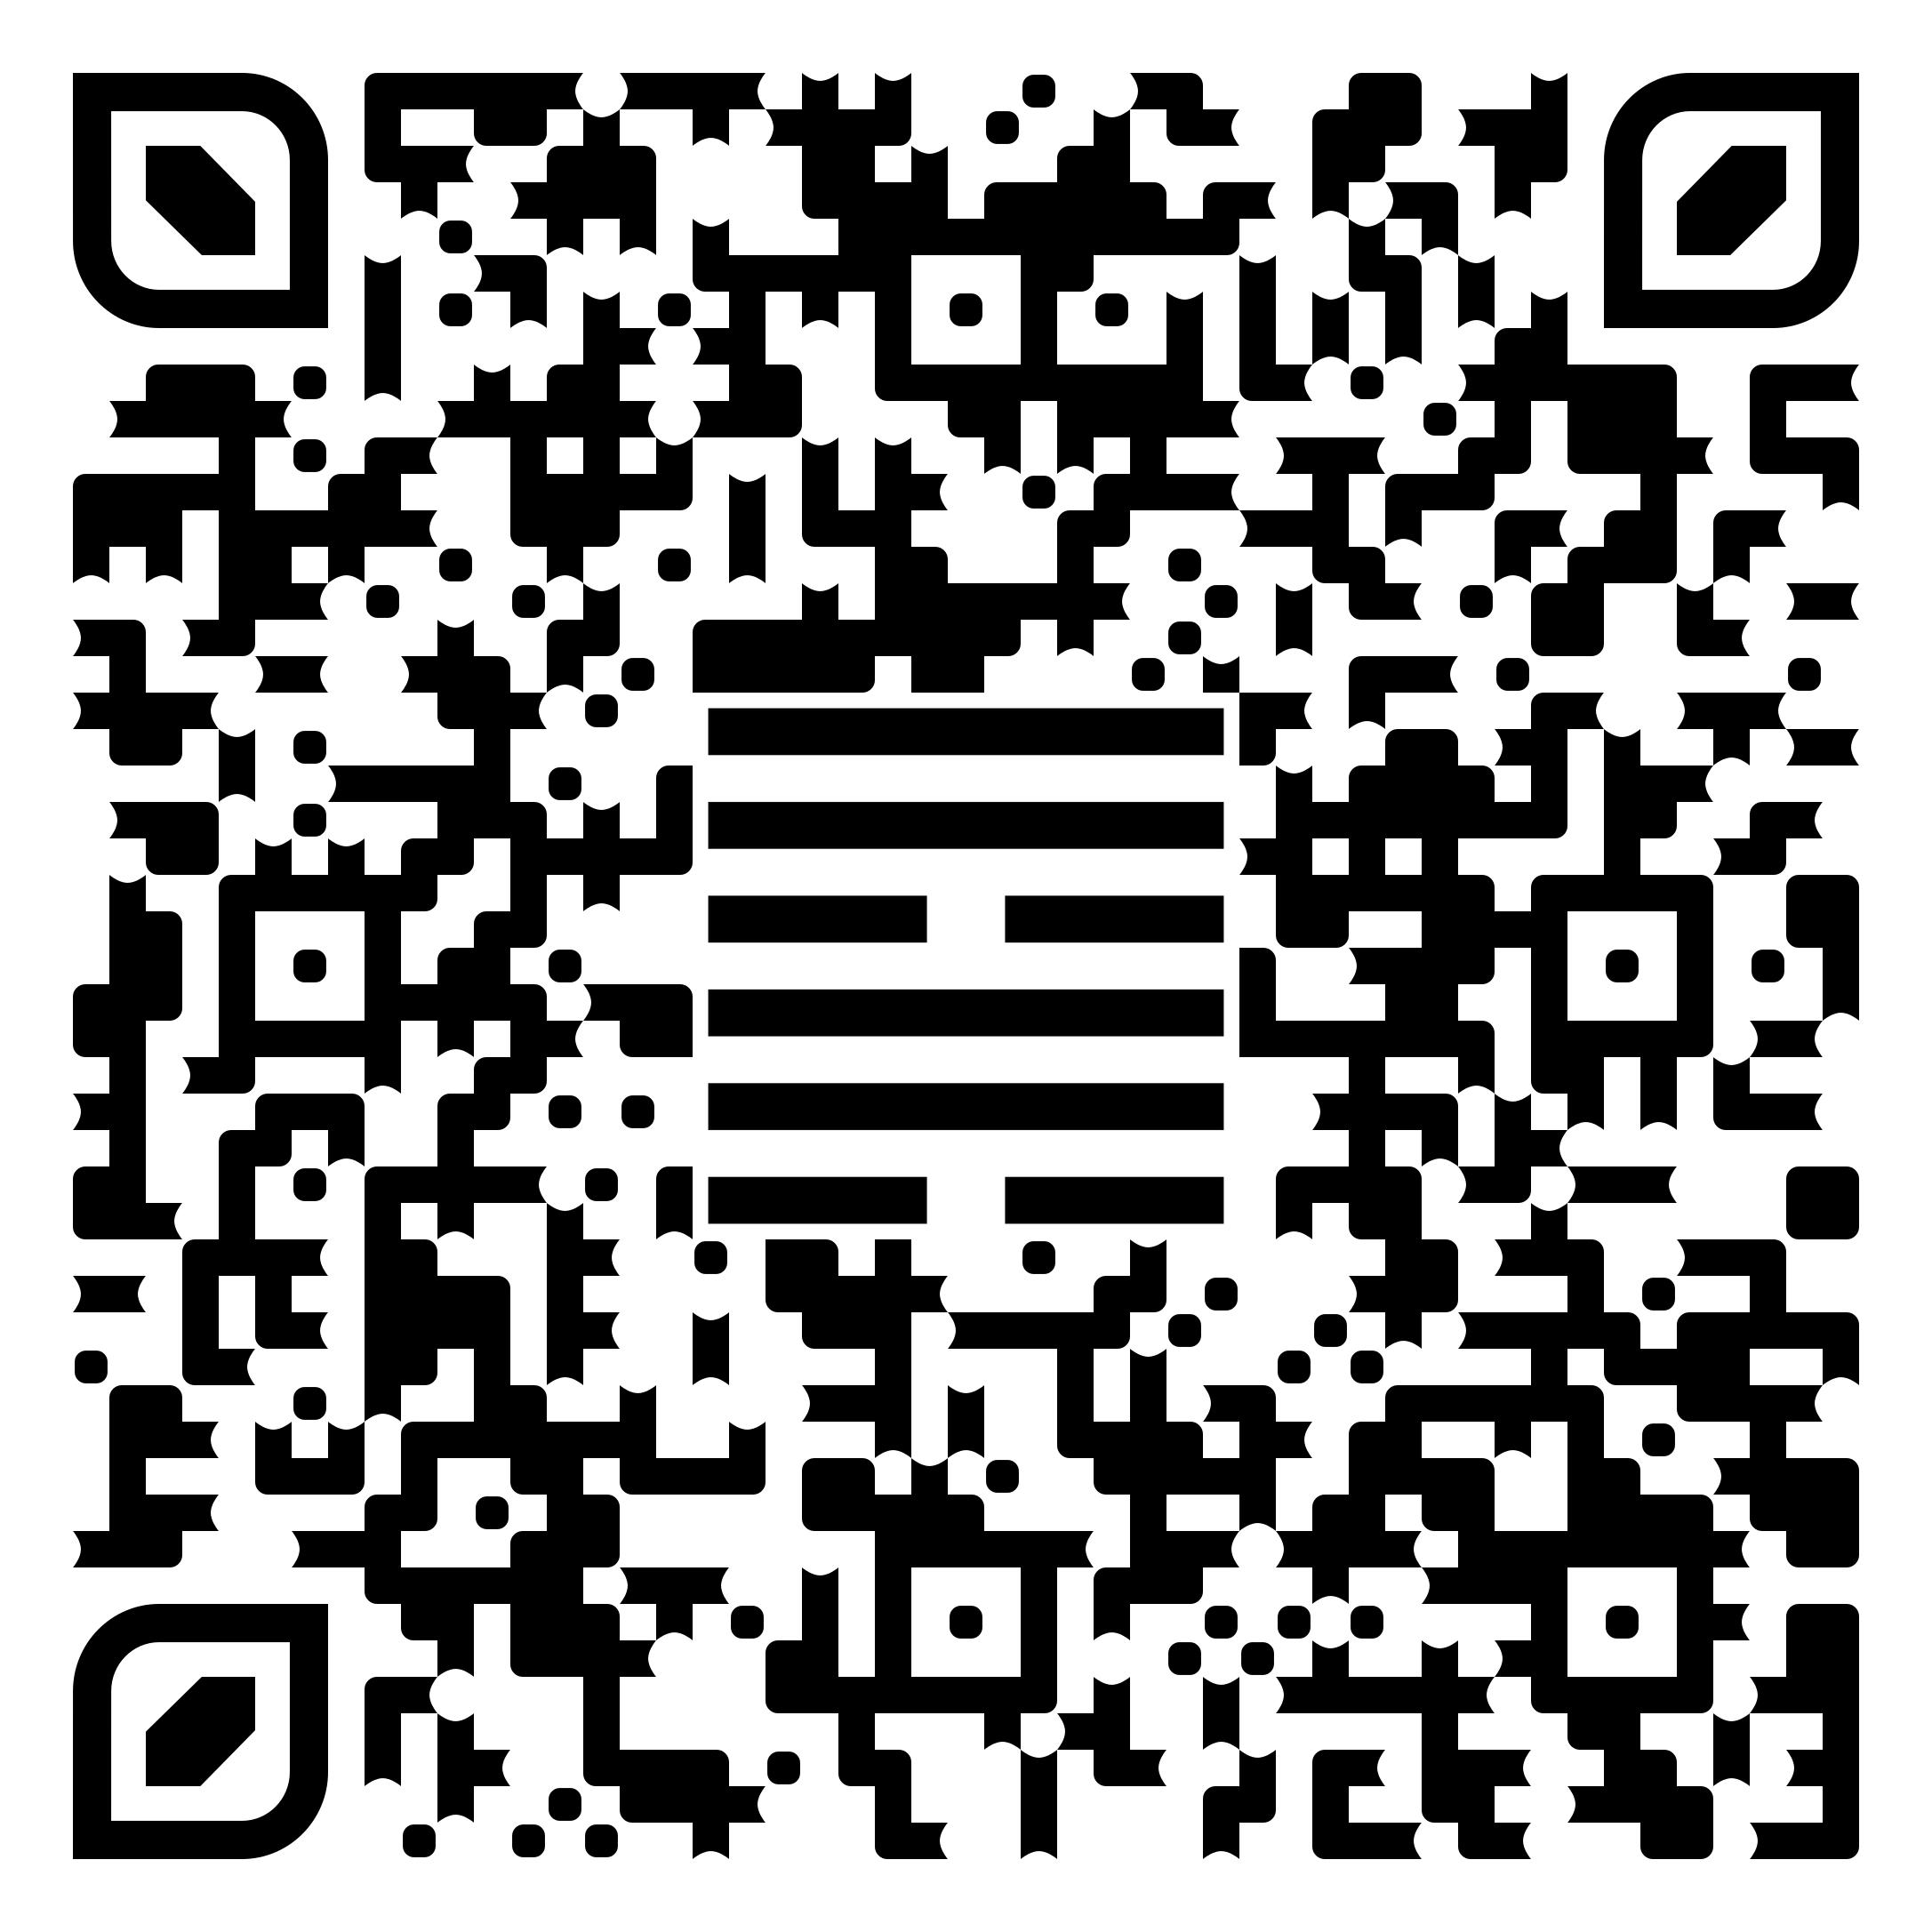 qr-code-57.png